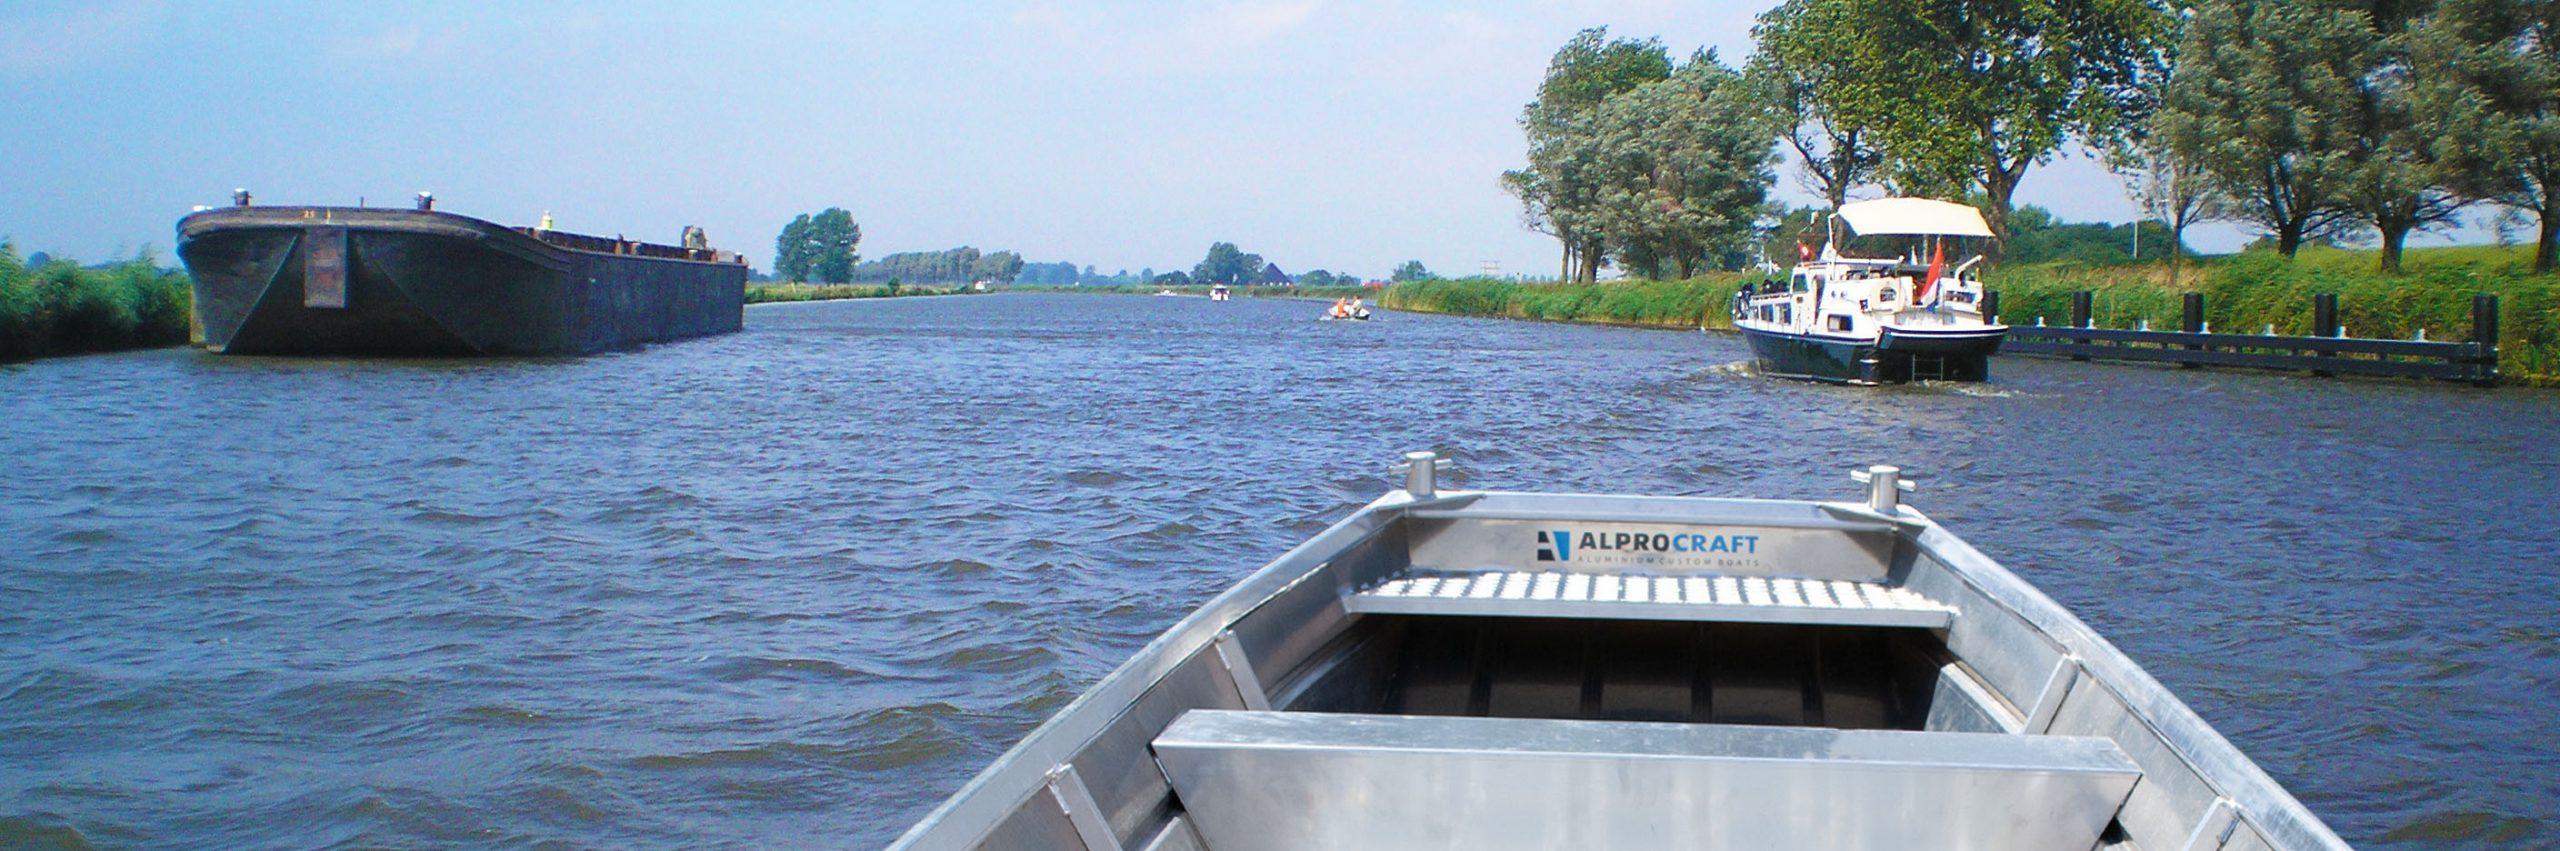 Products4Ships aluminum motor boat (flat bottom)